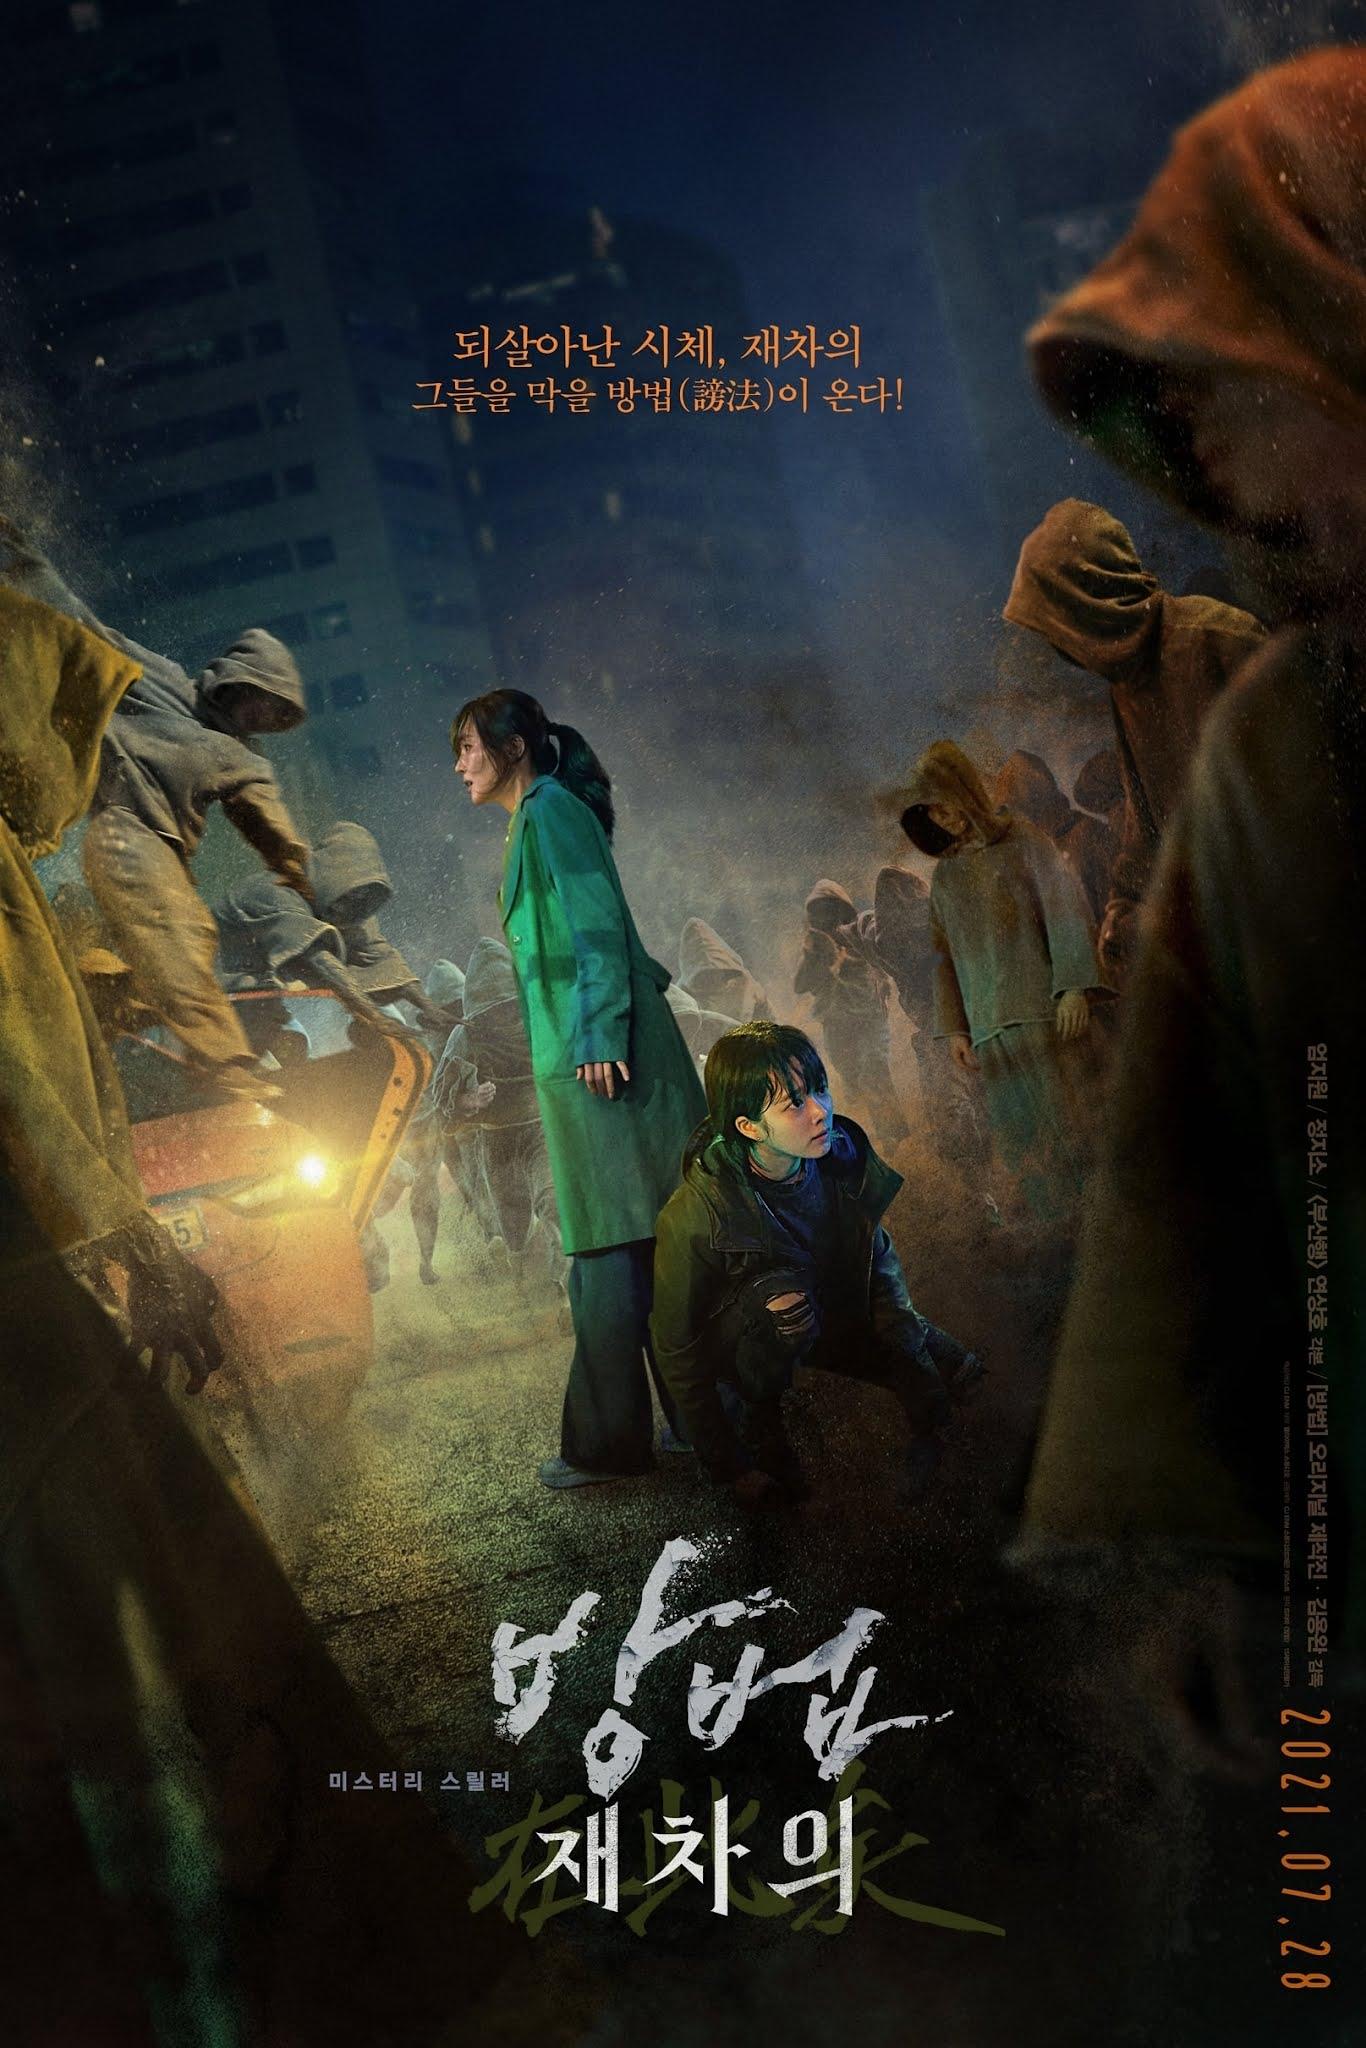 Nonton dan download Streaming Film The Cursed: Dead Man's Prey (2021) Sub Indo full movie